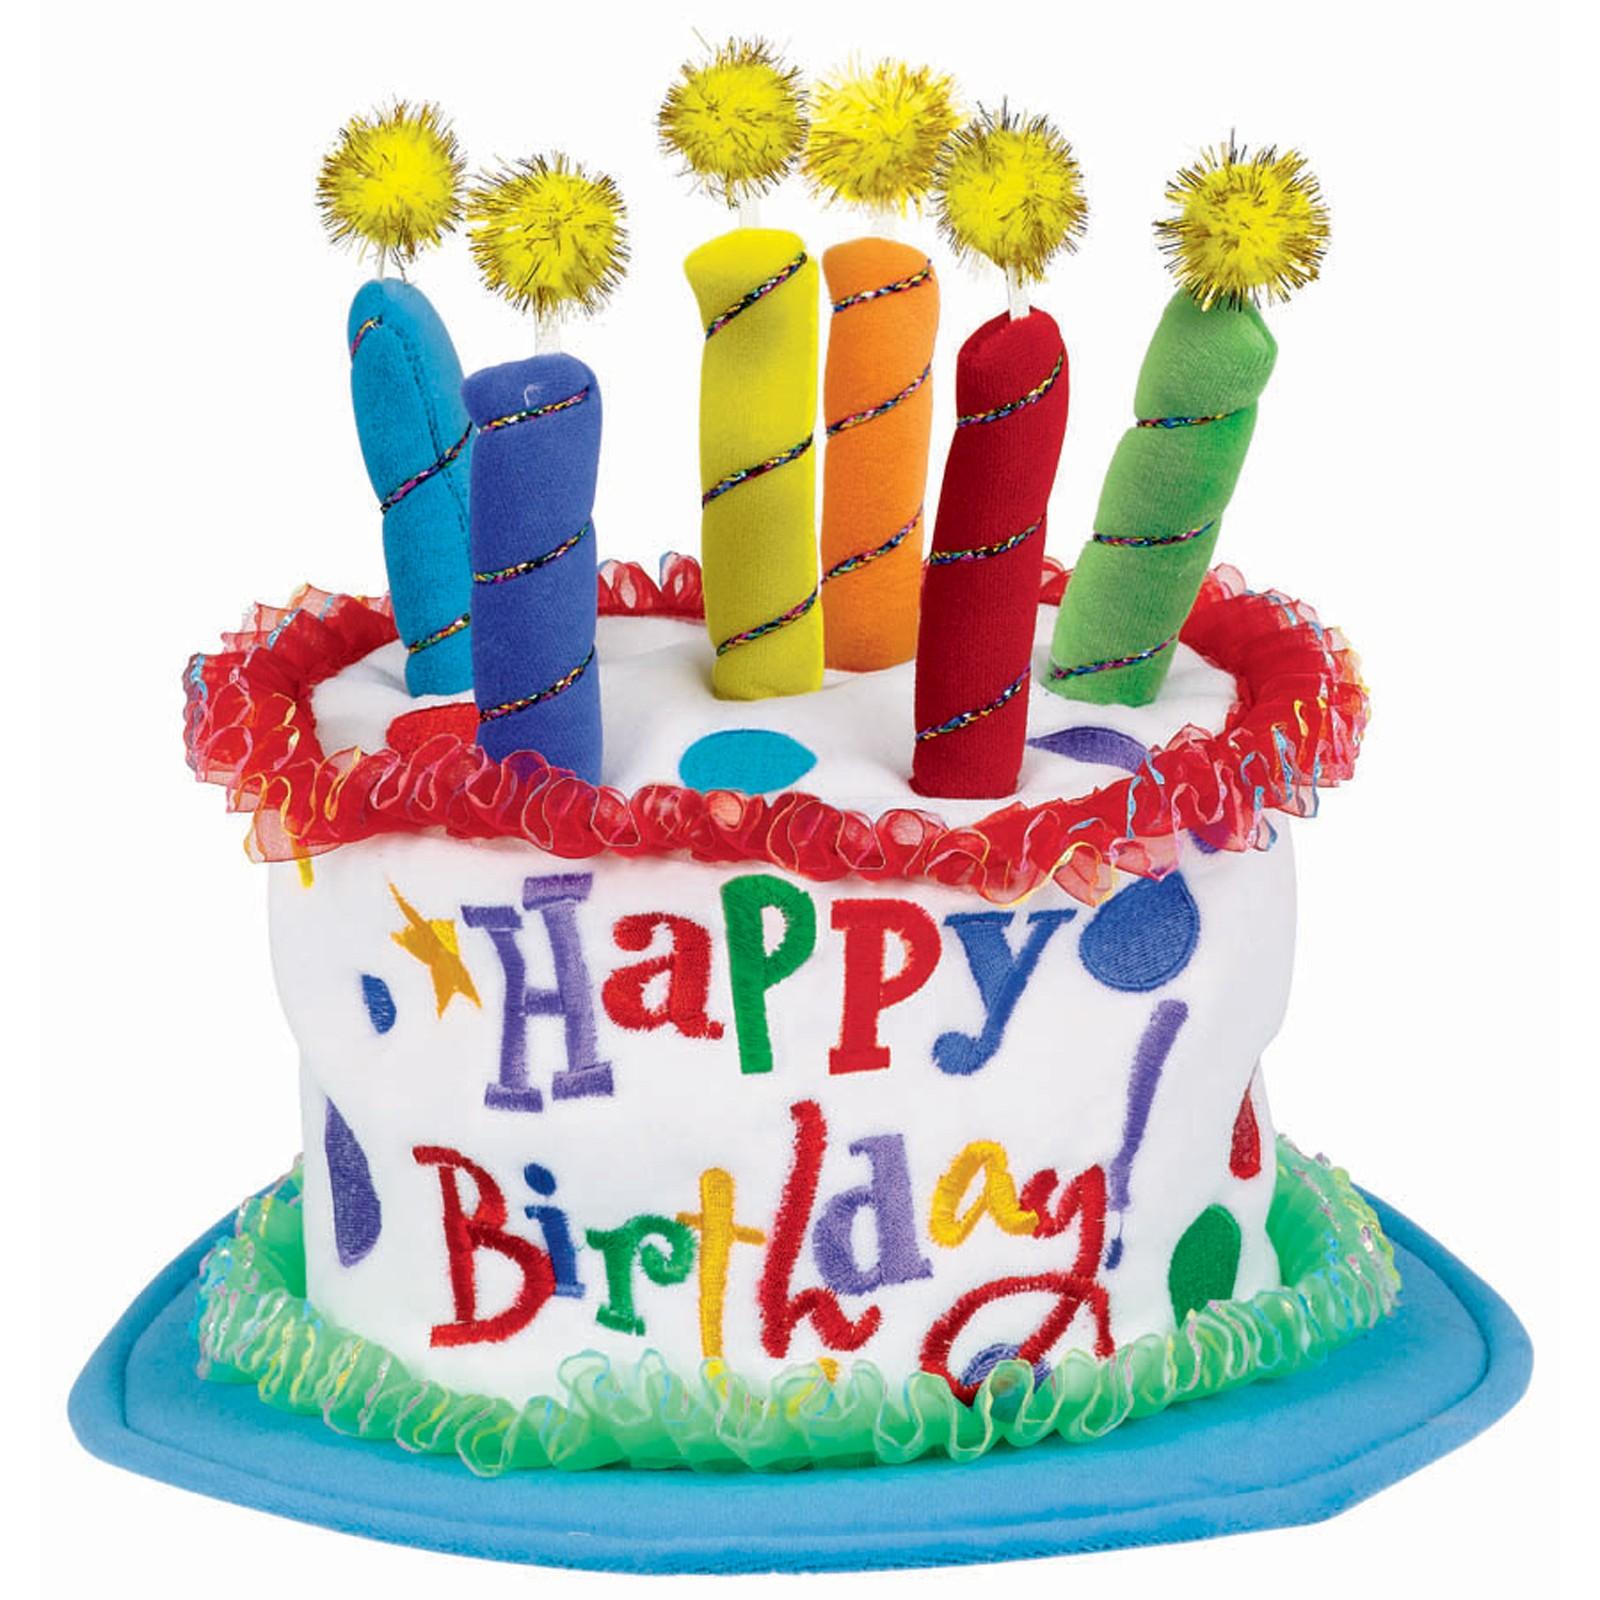 Happy Birthday, Spin Rewriter!